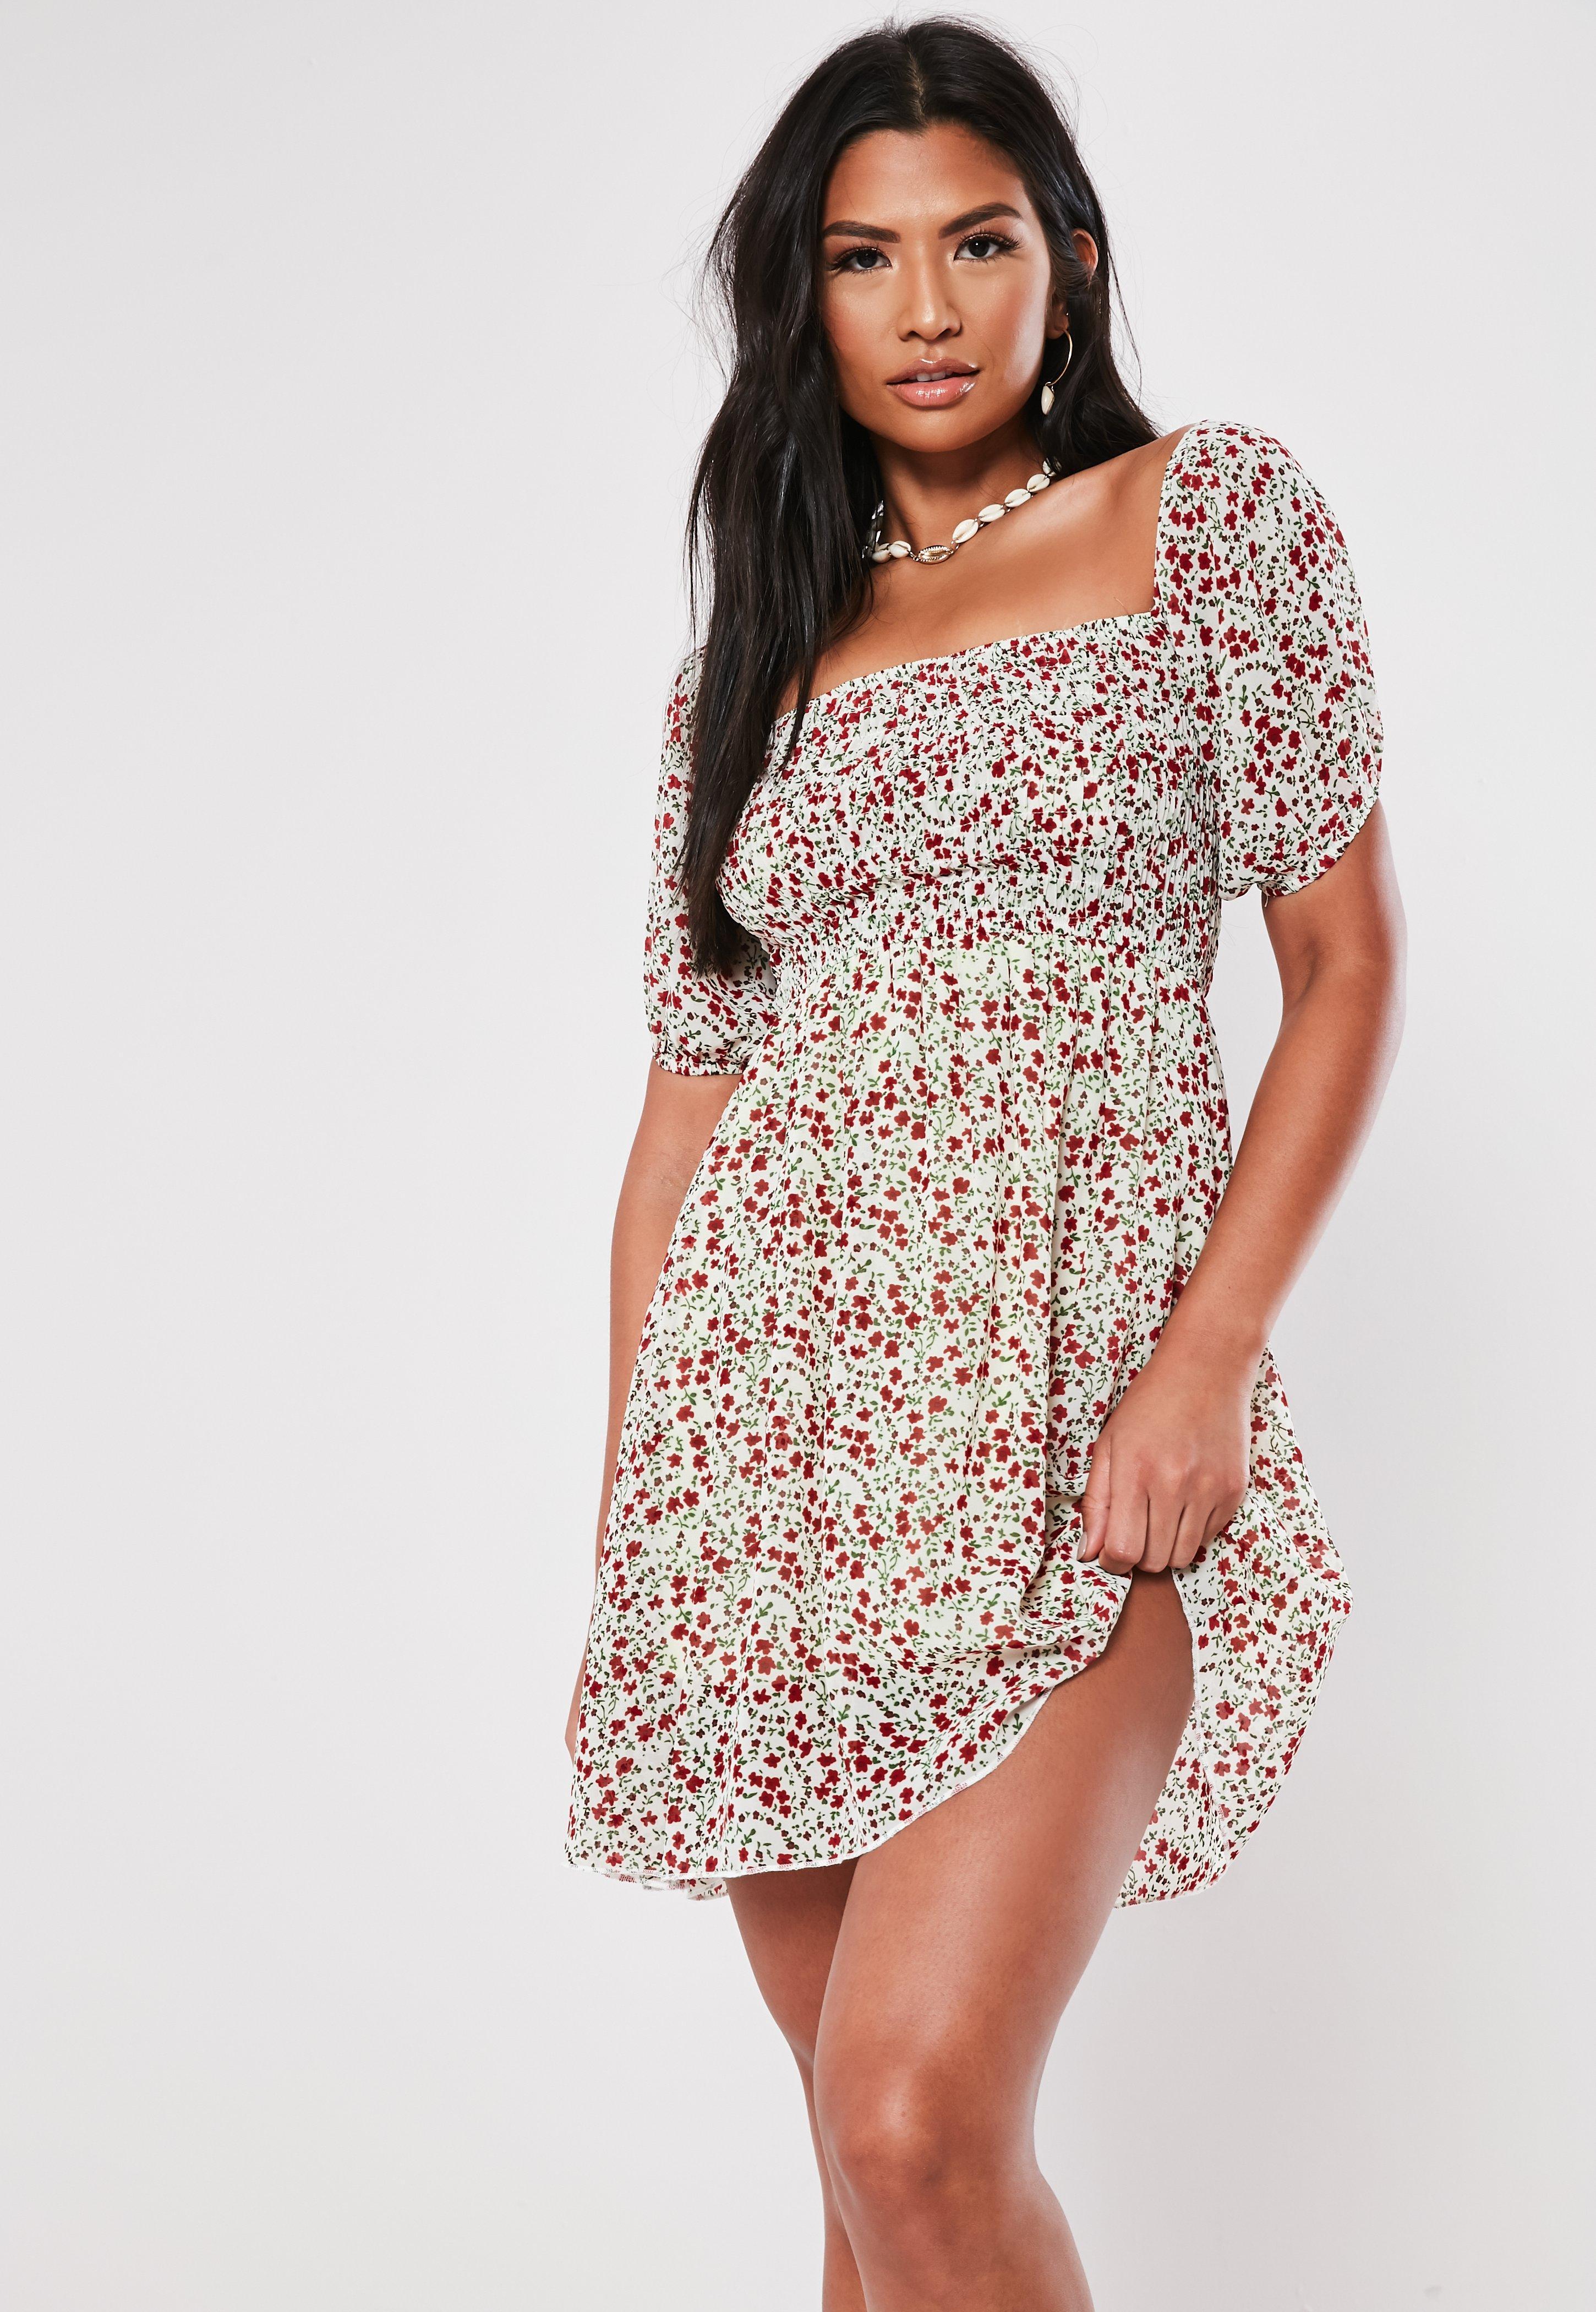 856c7557b5ee Floral Dresses | Flower Print Dresses - Missguided